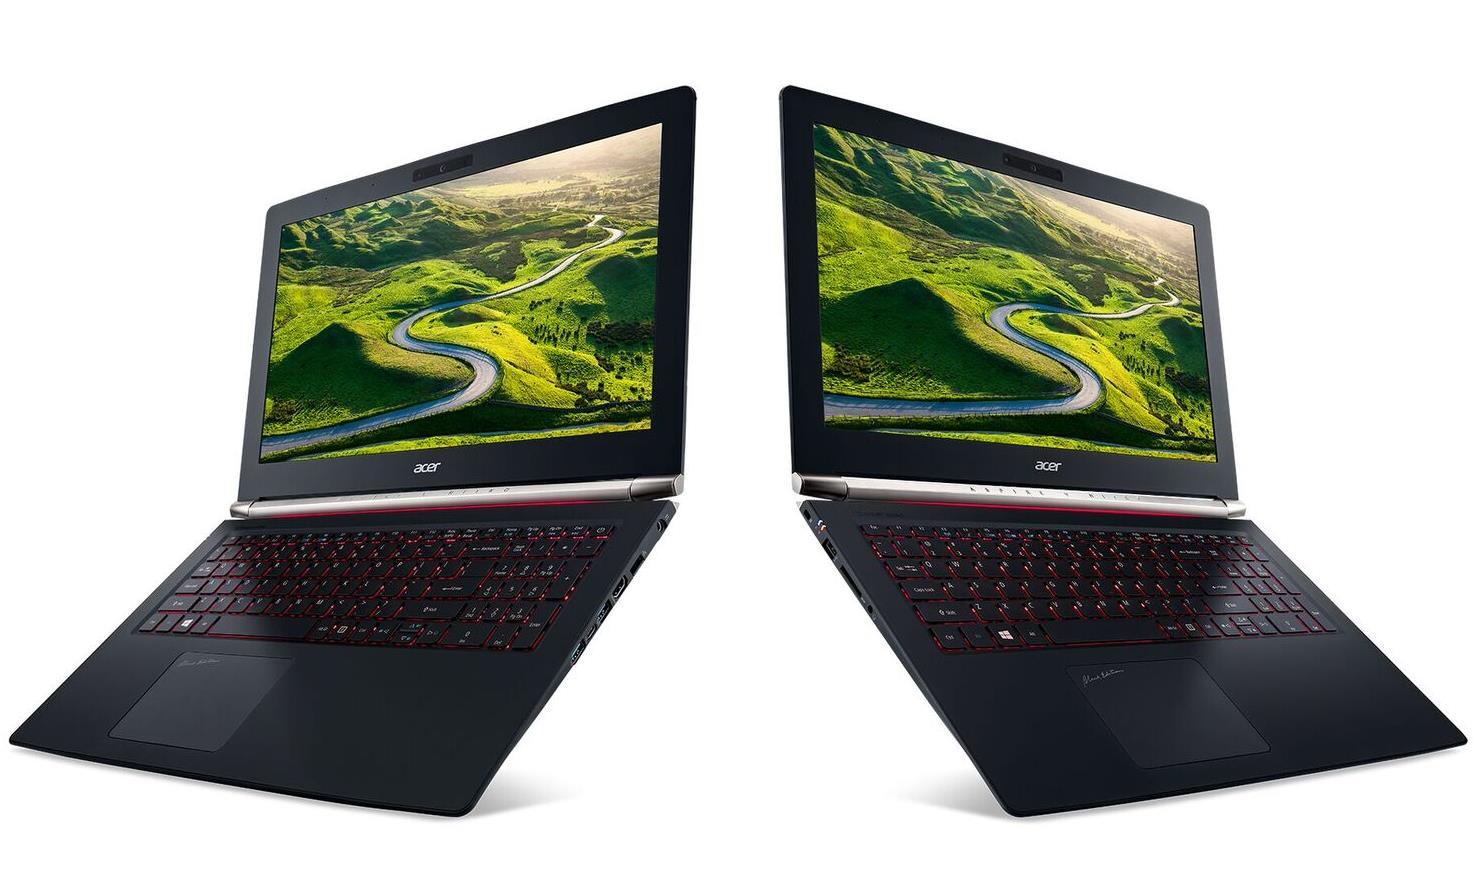 Acer Aspire V Nitro Black Edition notebook